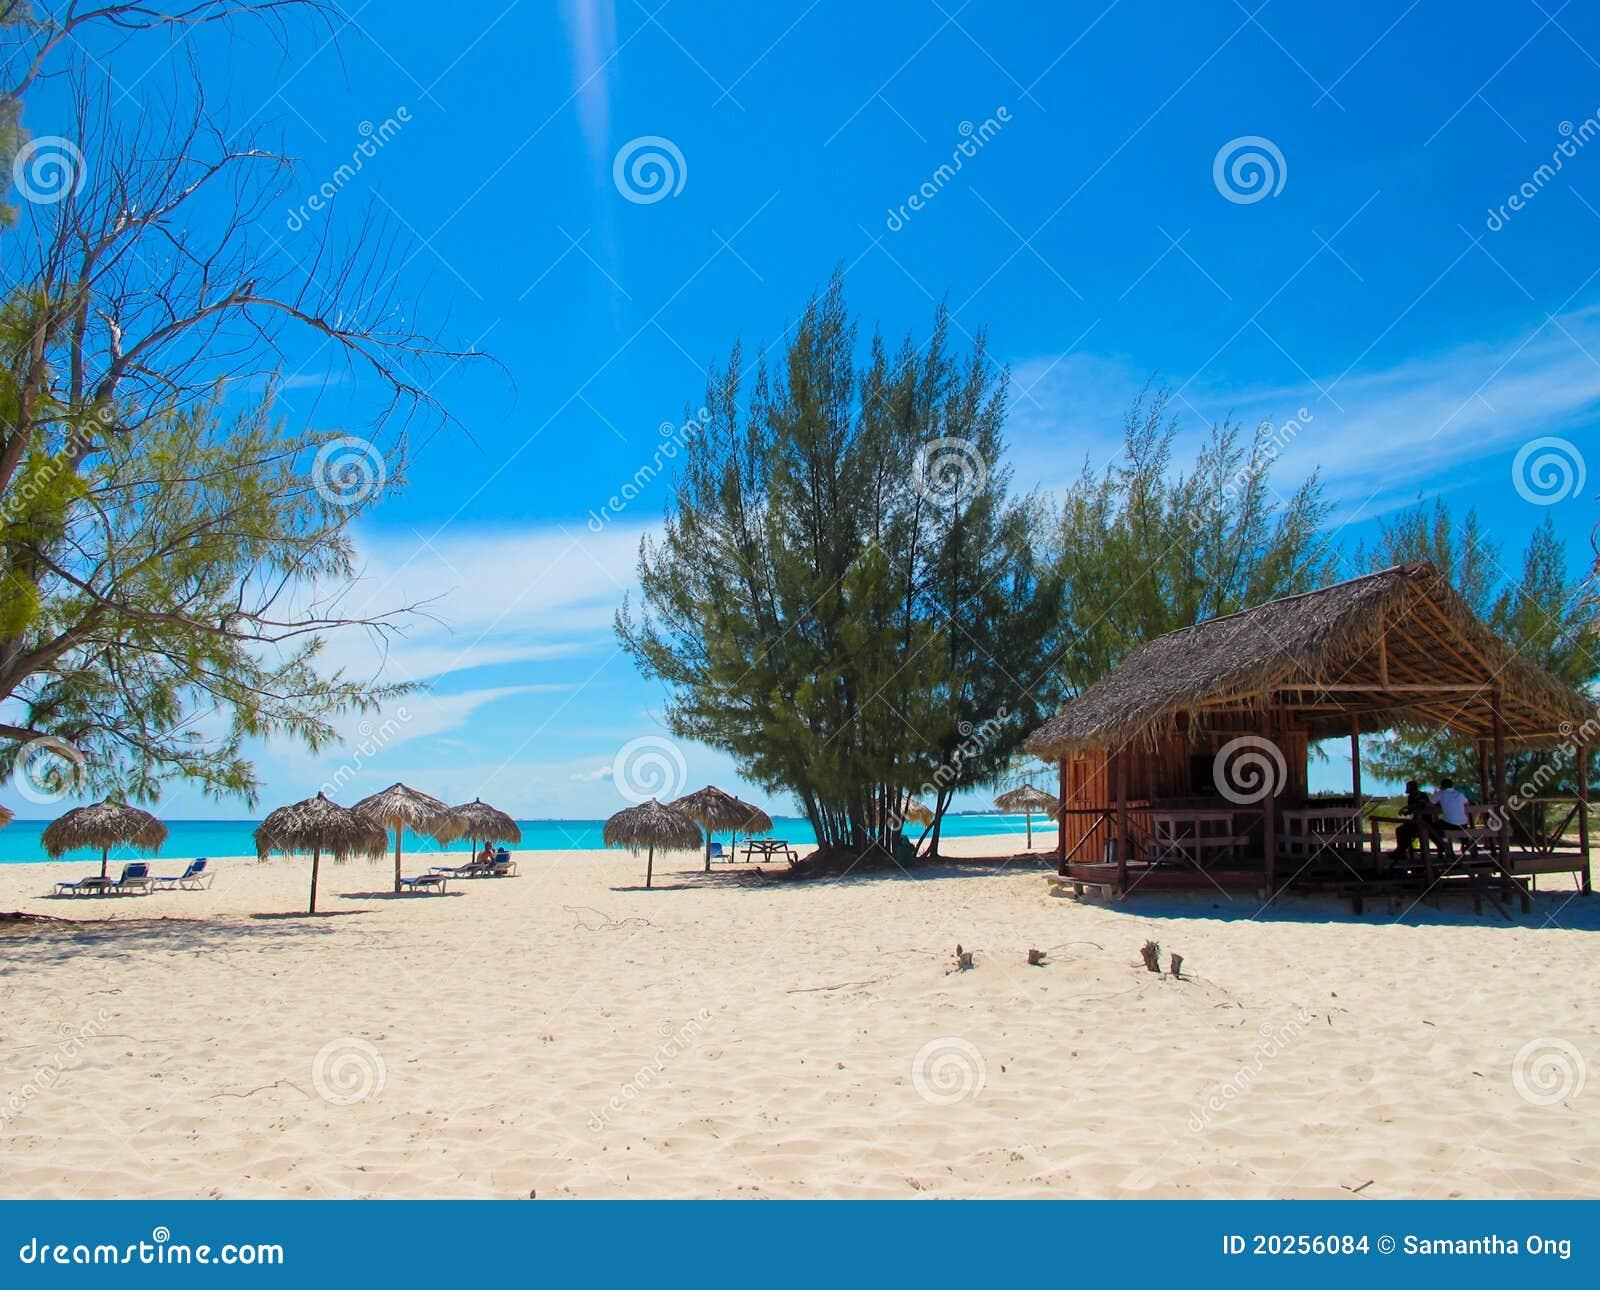 Cayo paraiso beach